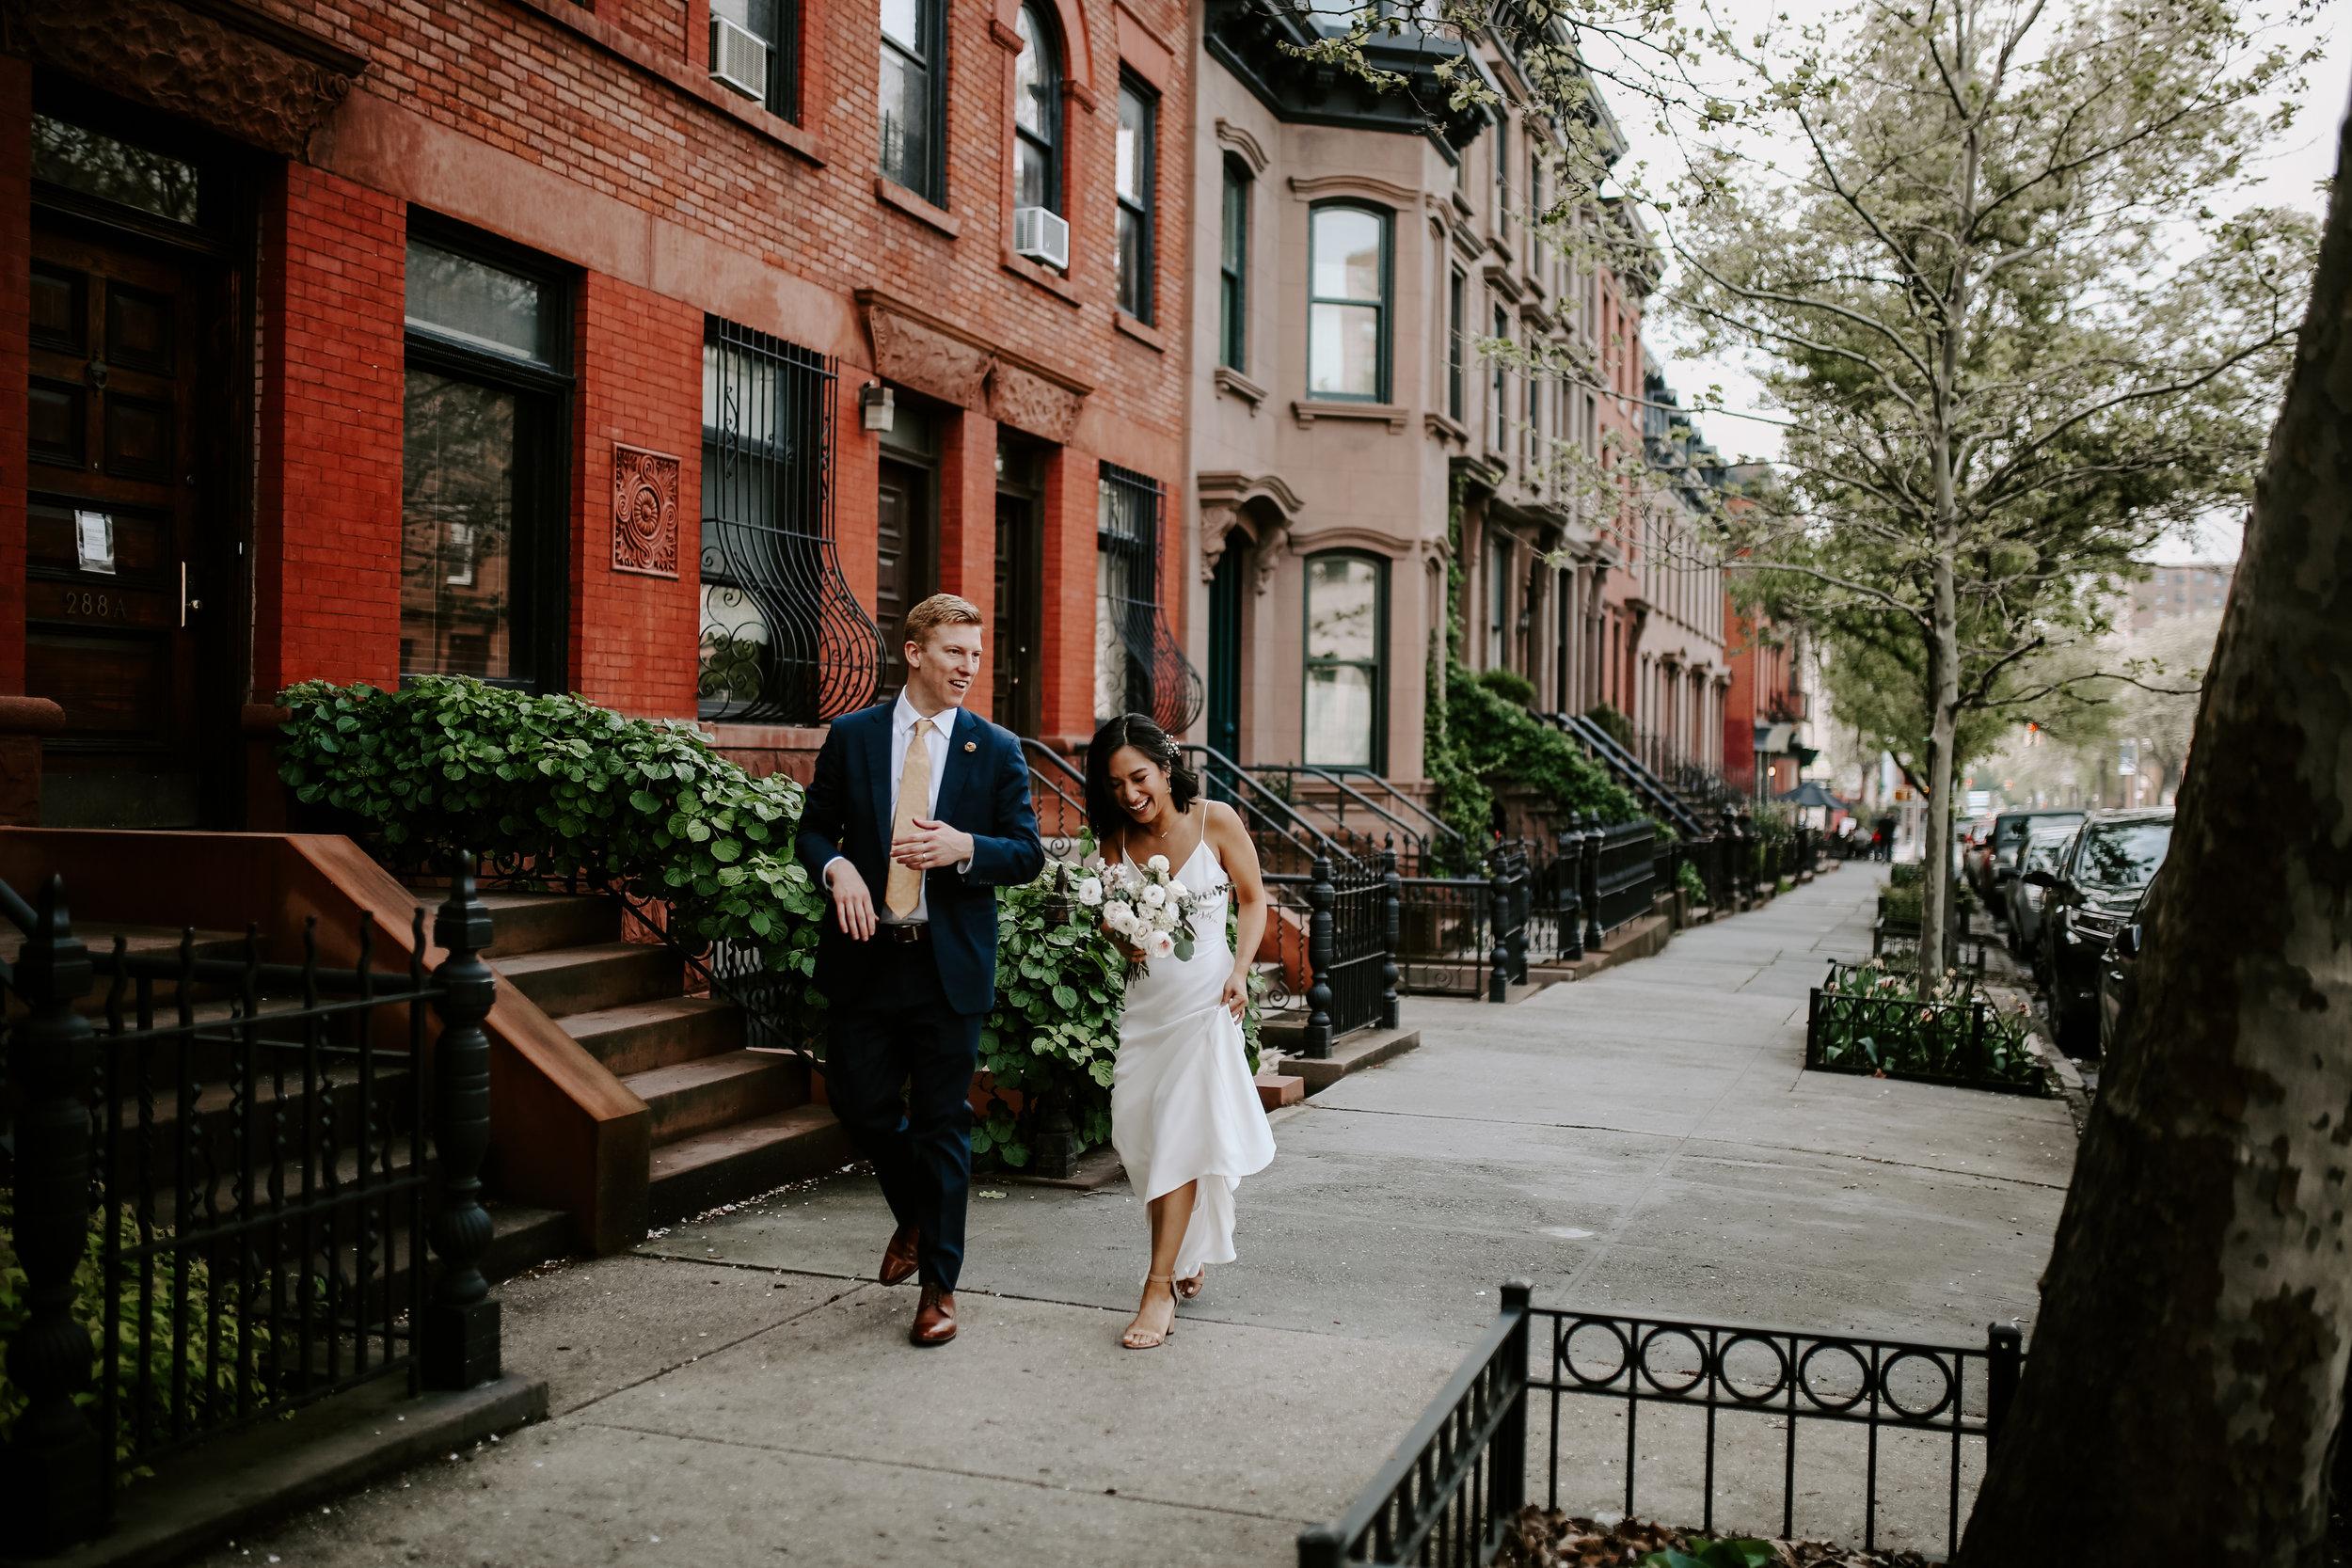 TheNichols_Married_2019-7.jpg